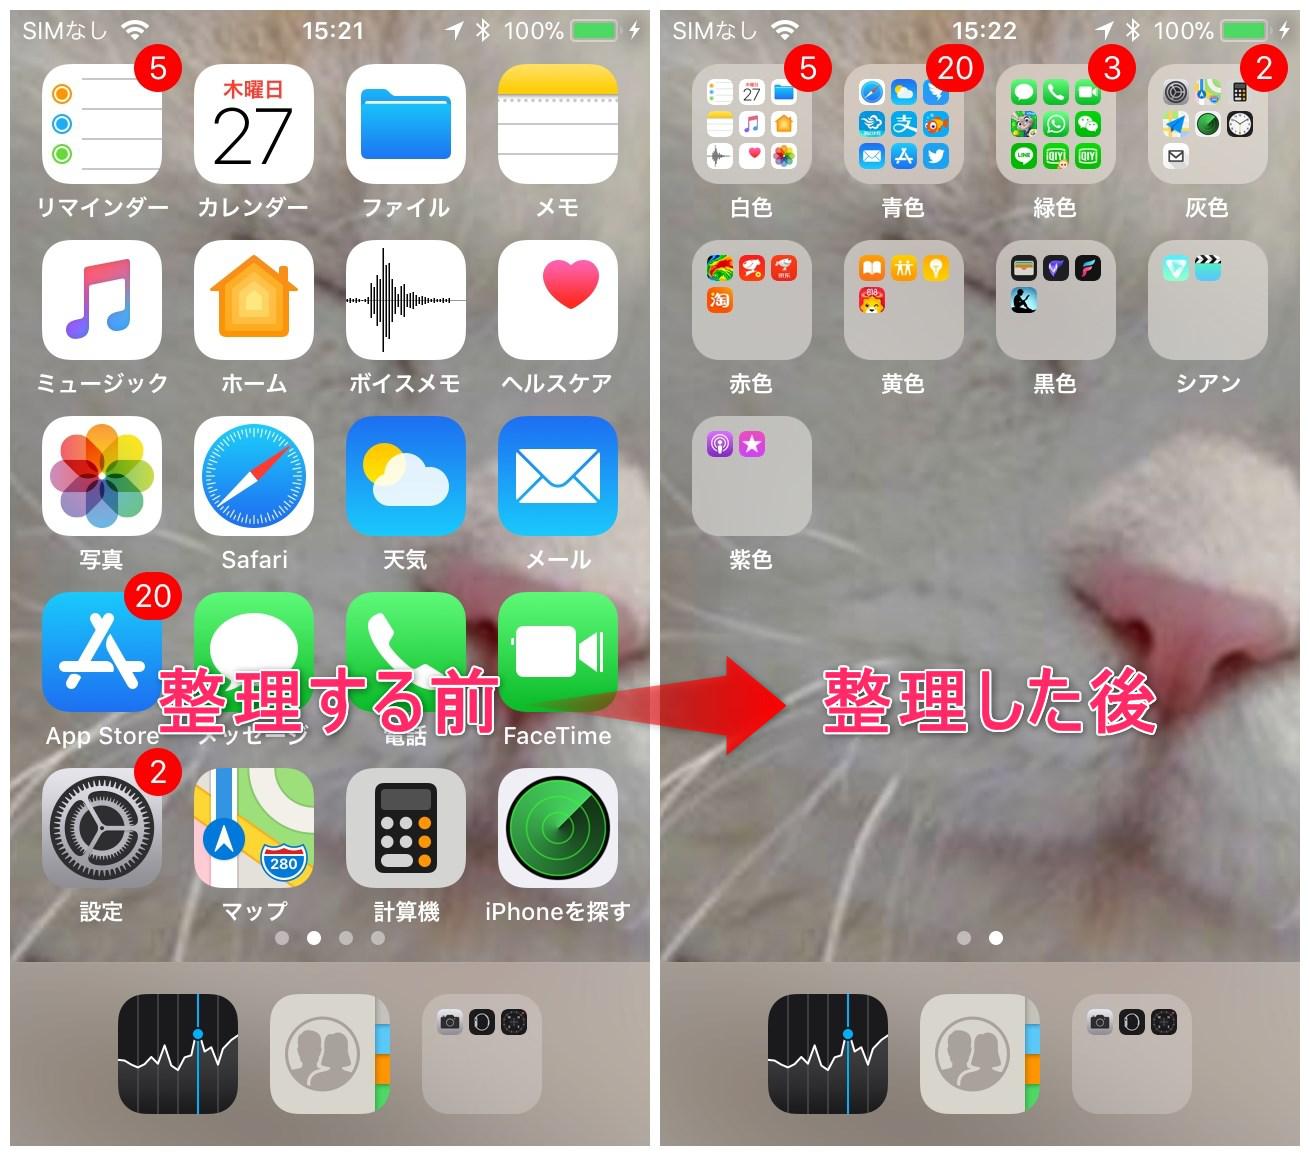 iPhoneホーム画面のアプリのアイコンを自由に配置する方法